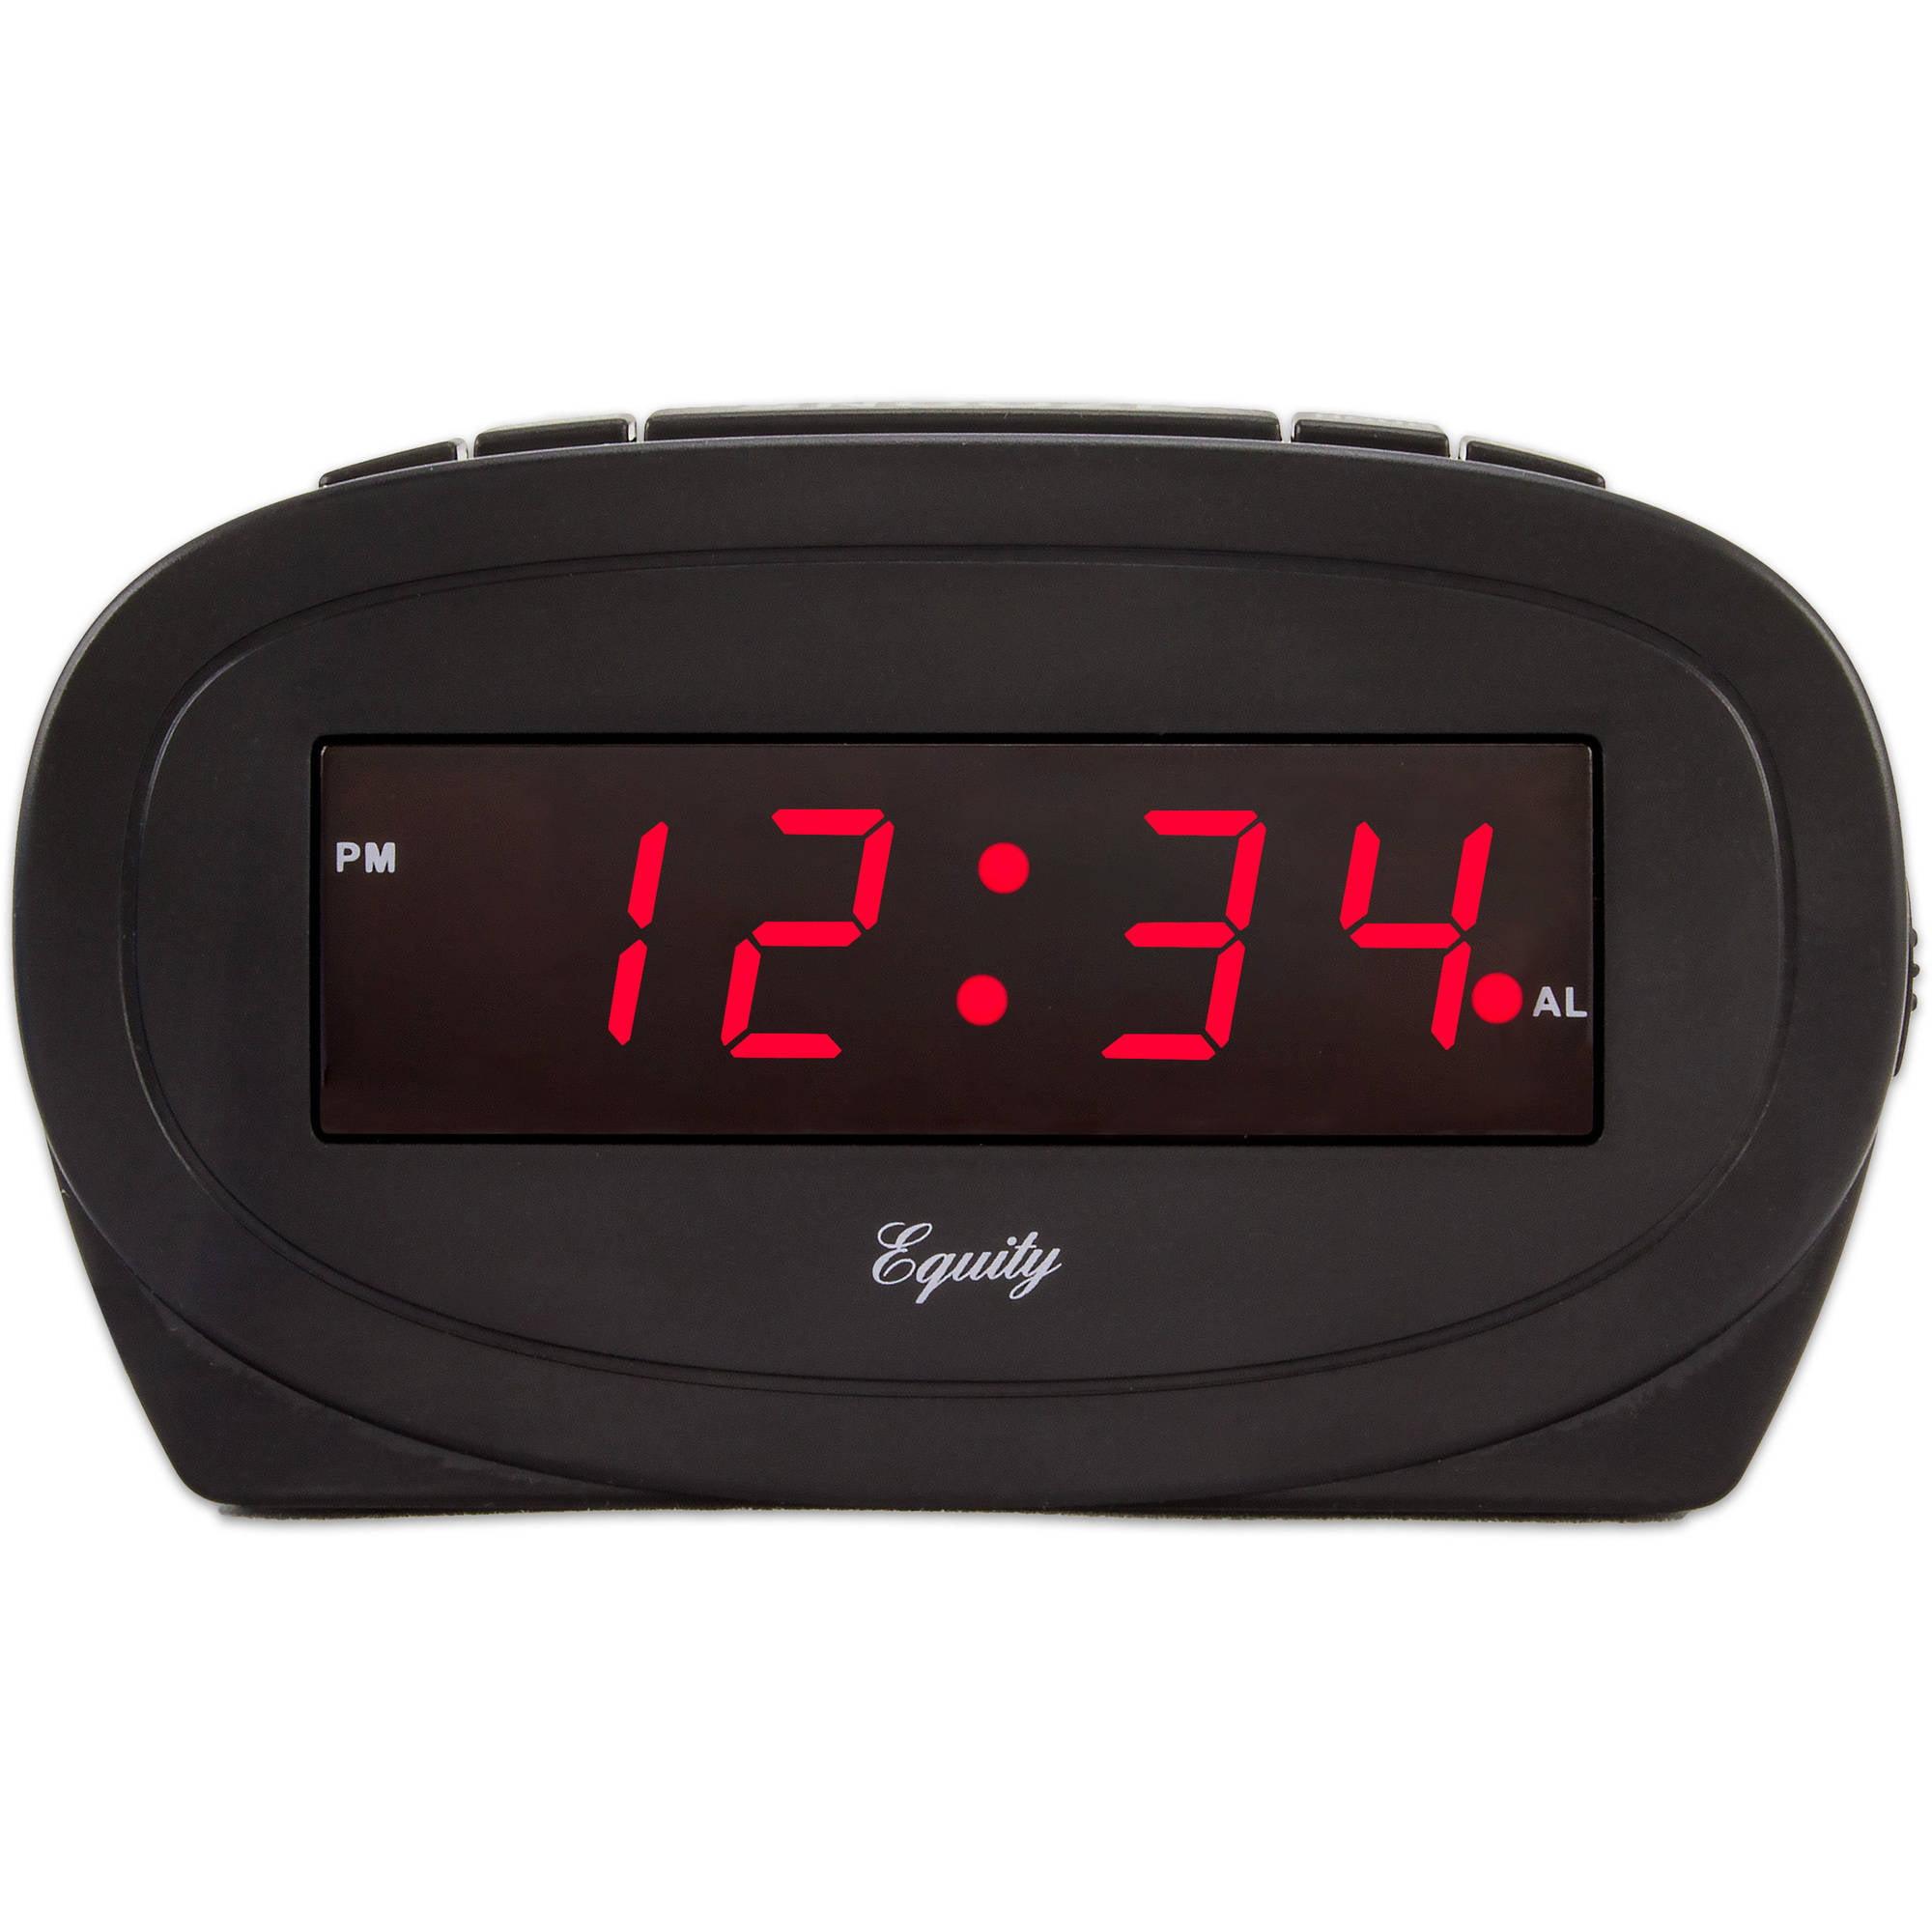 La Crosse Technology Equity Black LED Alarm Clock by La Crosse Technology